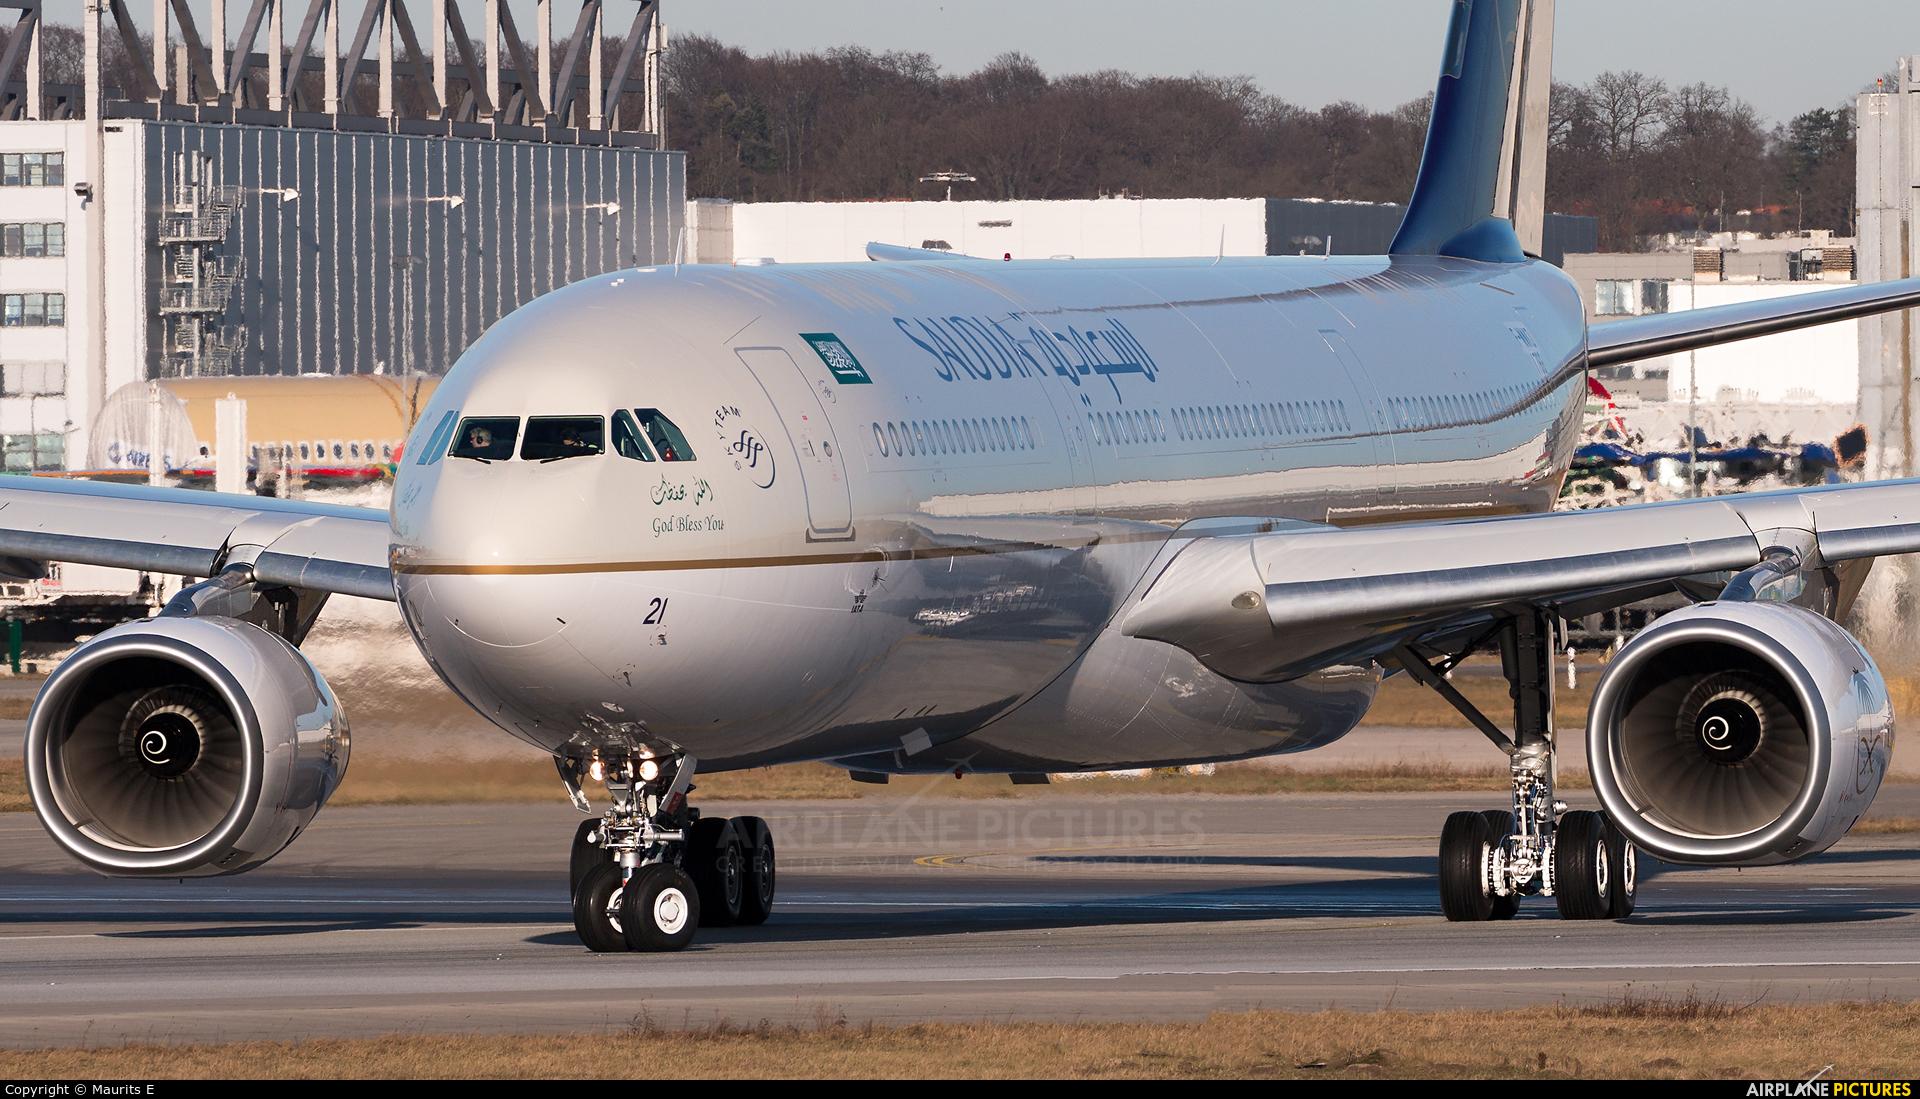 Saudi Arabian Airlines F-WWKD aircraft at Hamburg - Finkenwerder